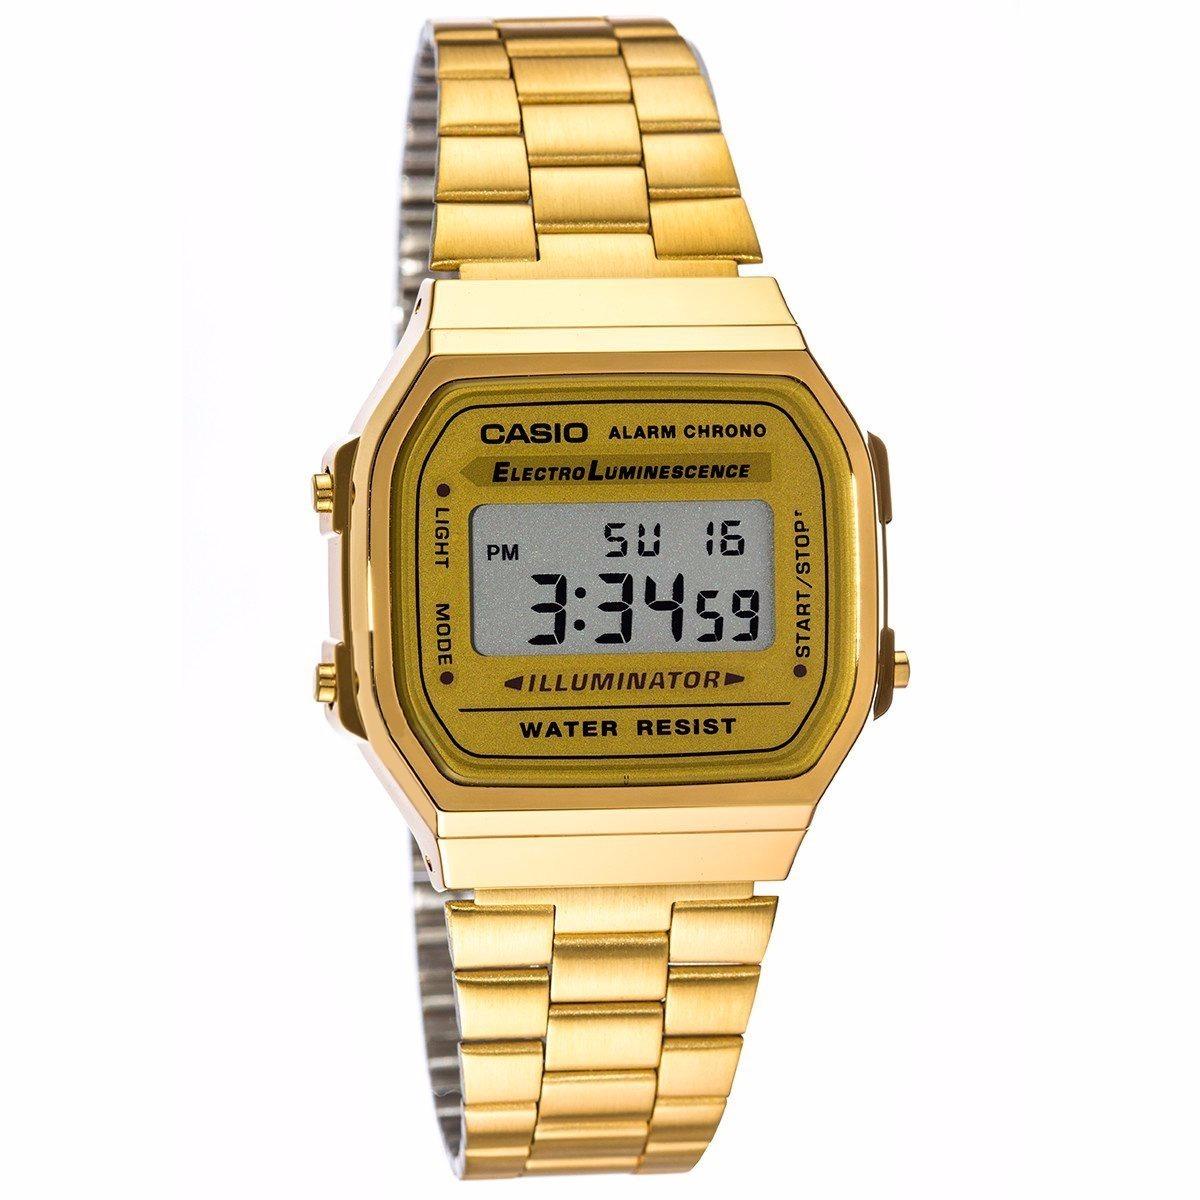 A168 Casio Vintage Gratis Envío Original Dorado Reloj Retro qGLpSVMUz